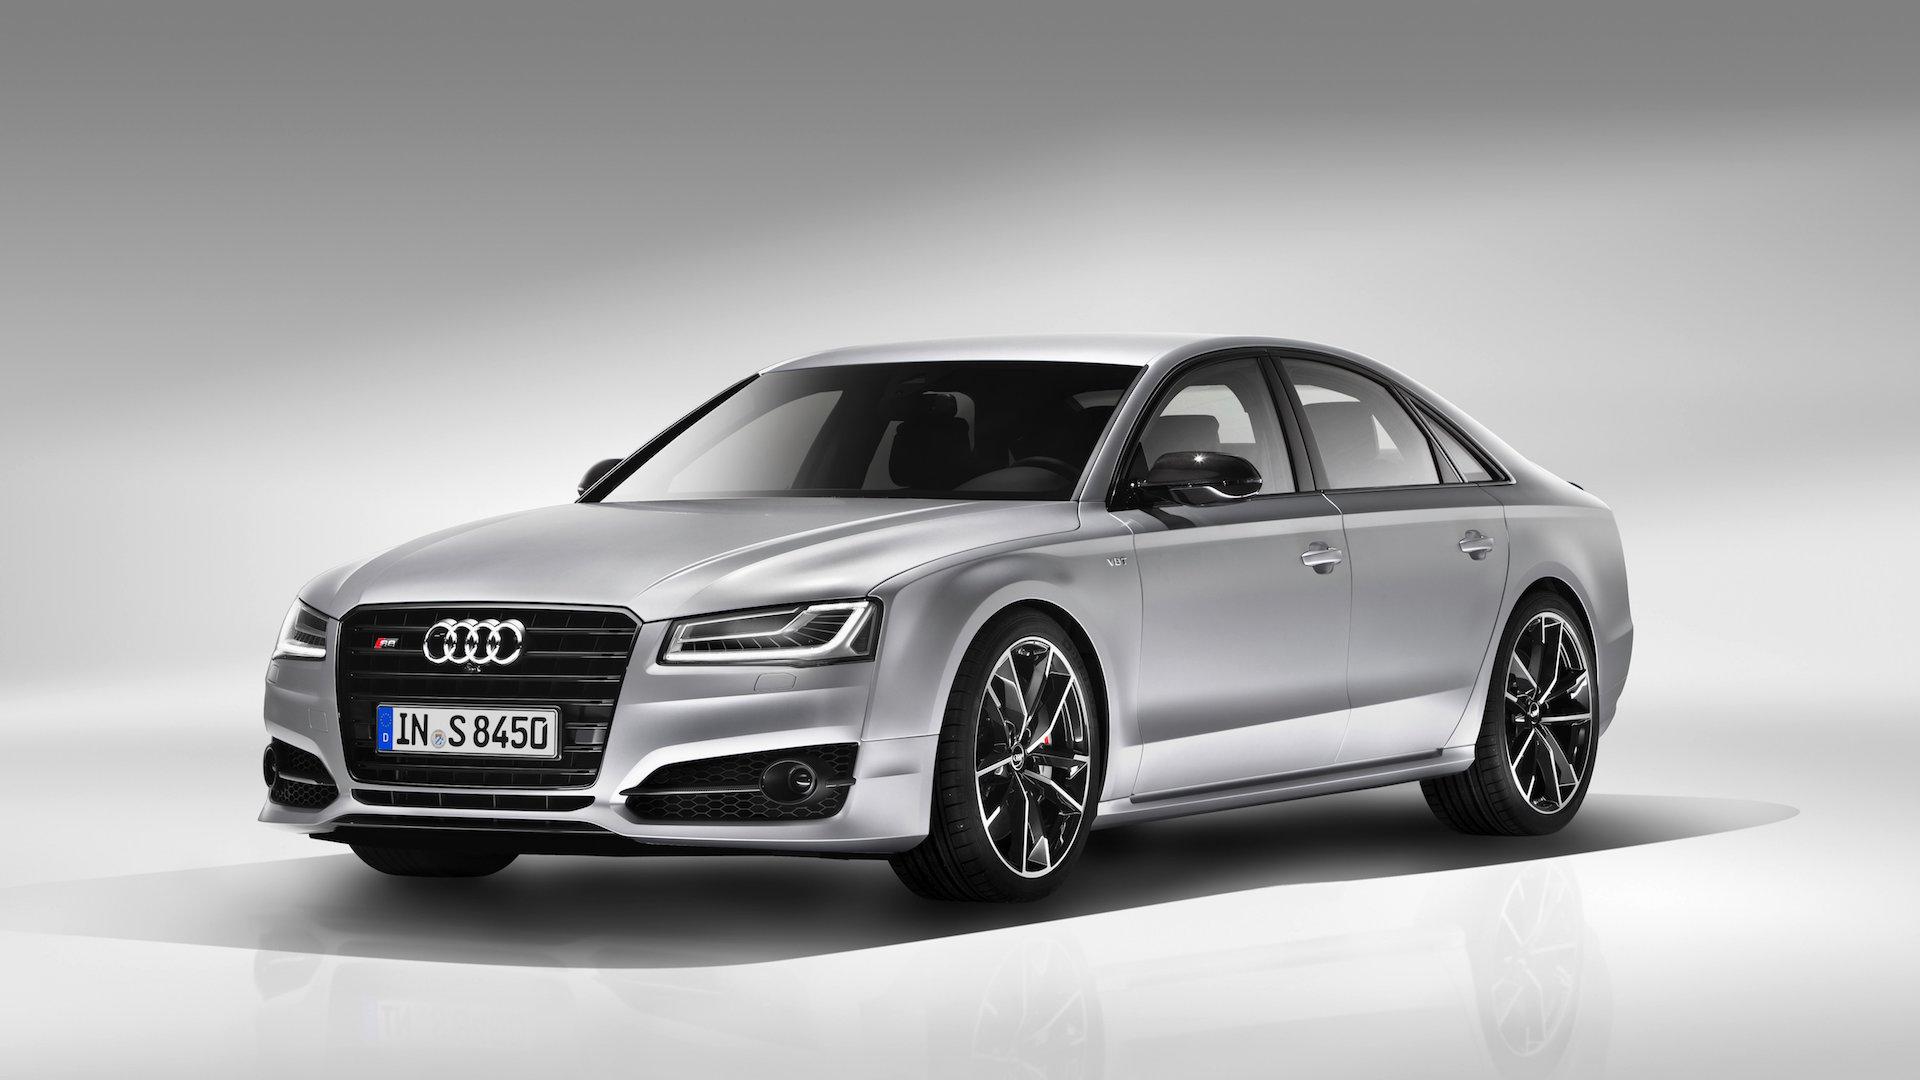 Kelebihan Audi 2017 Murah Berkualitas